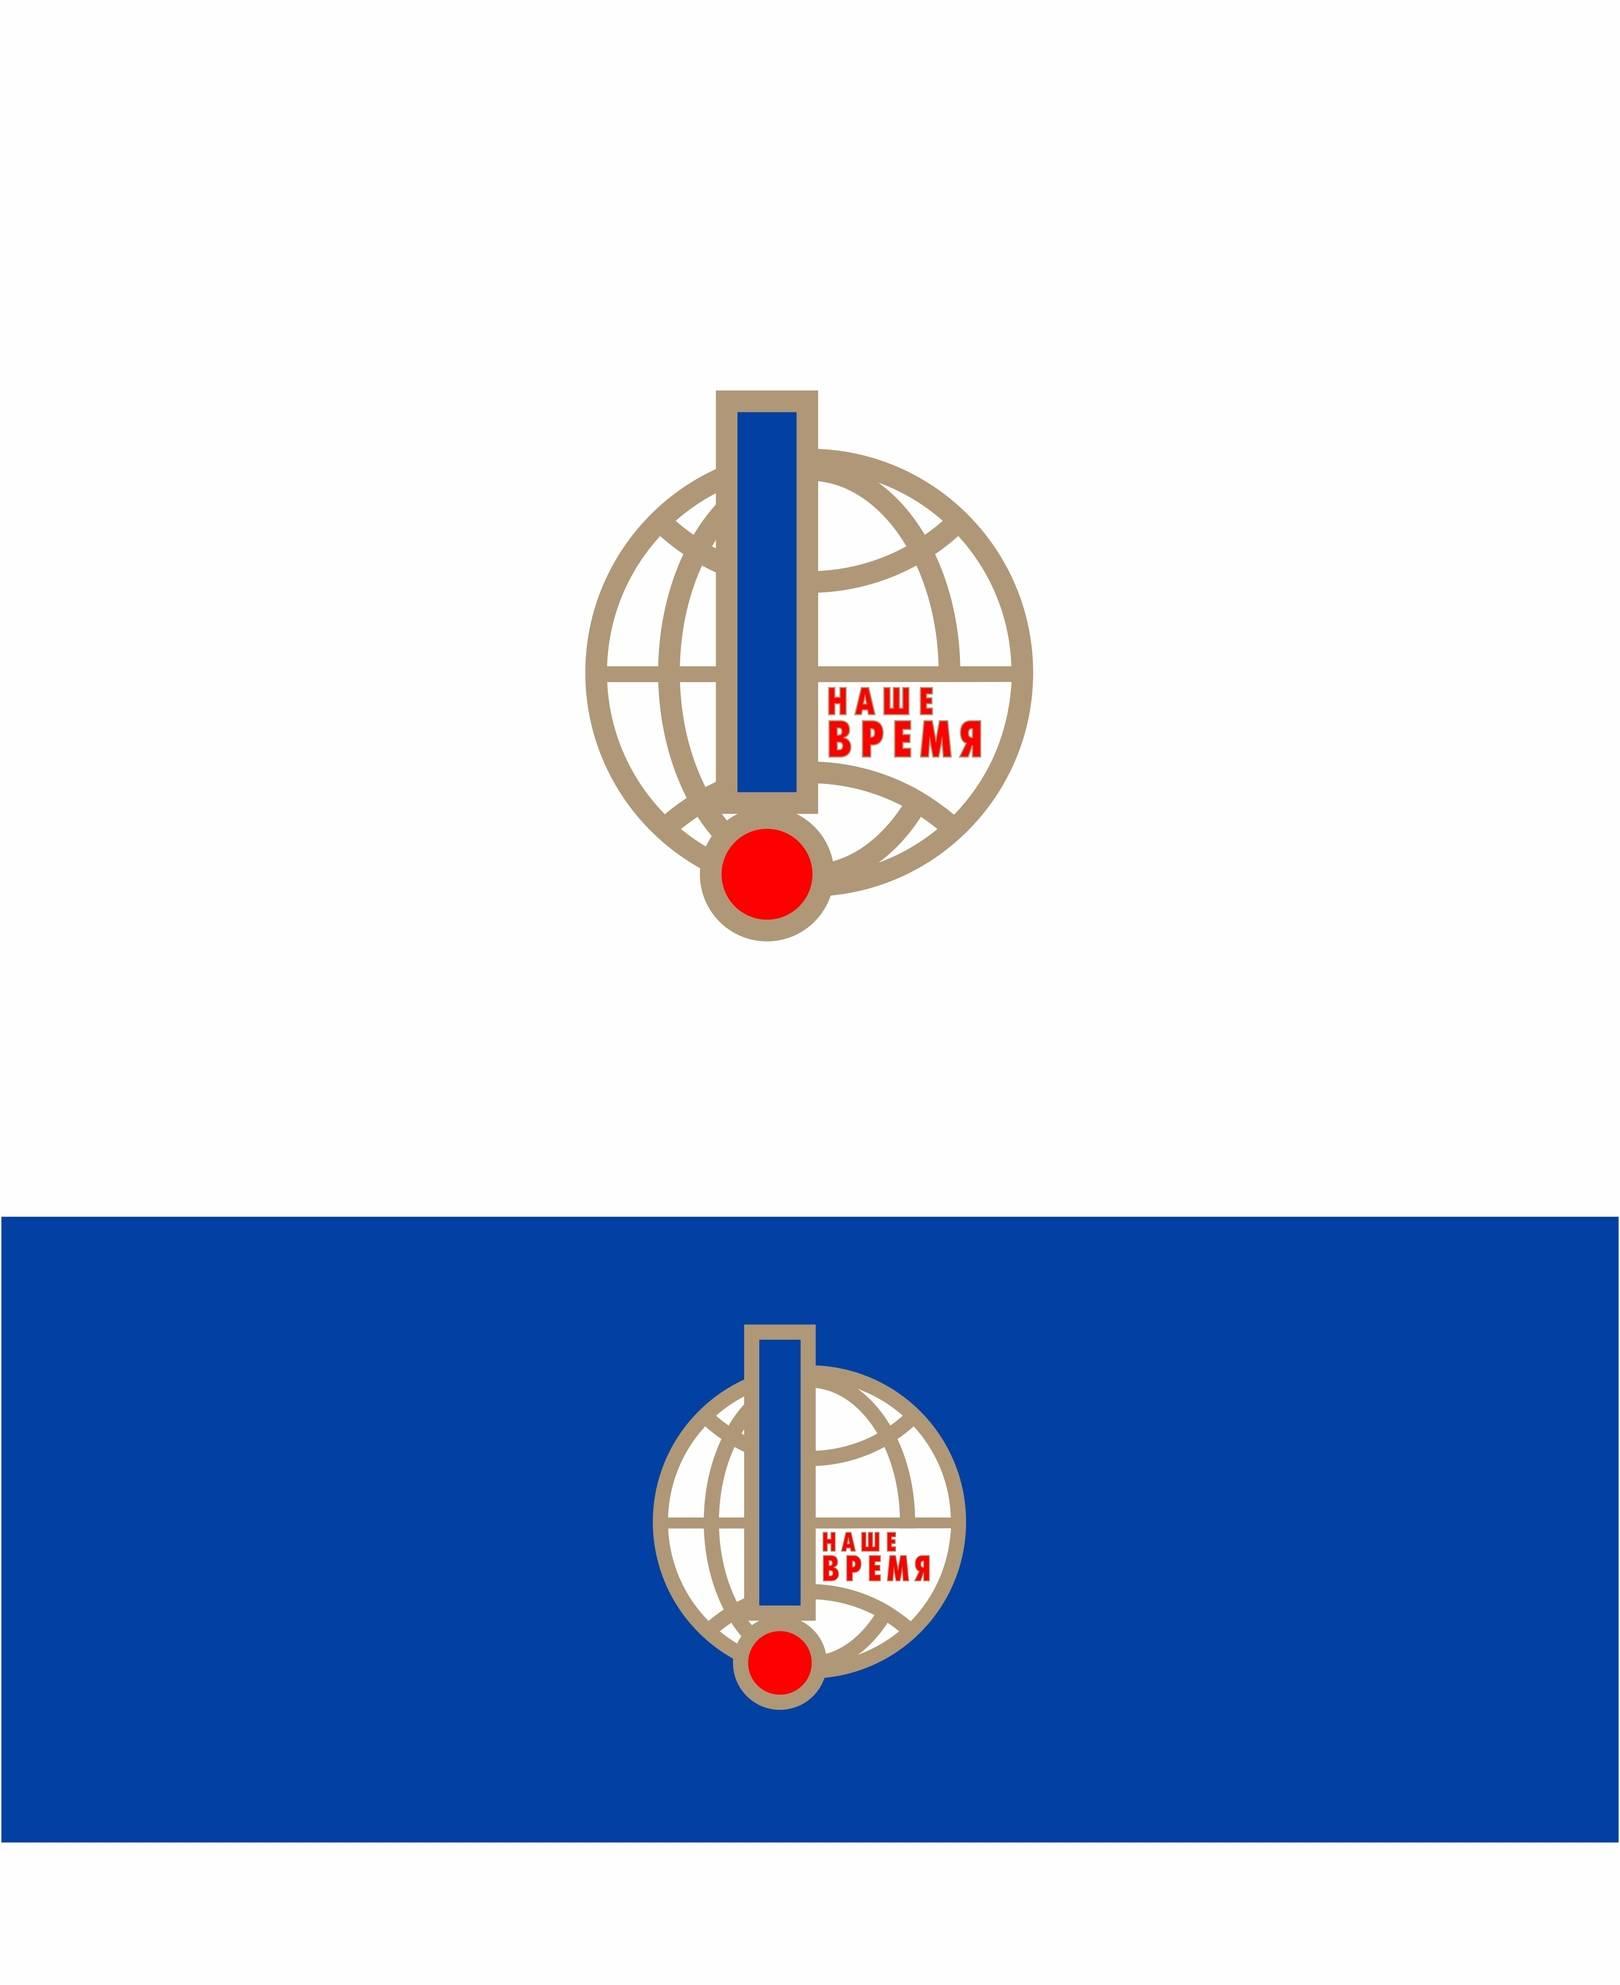 Вариант логотипа.